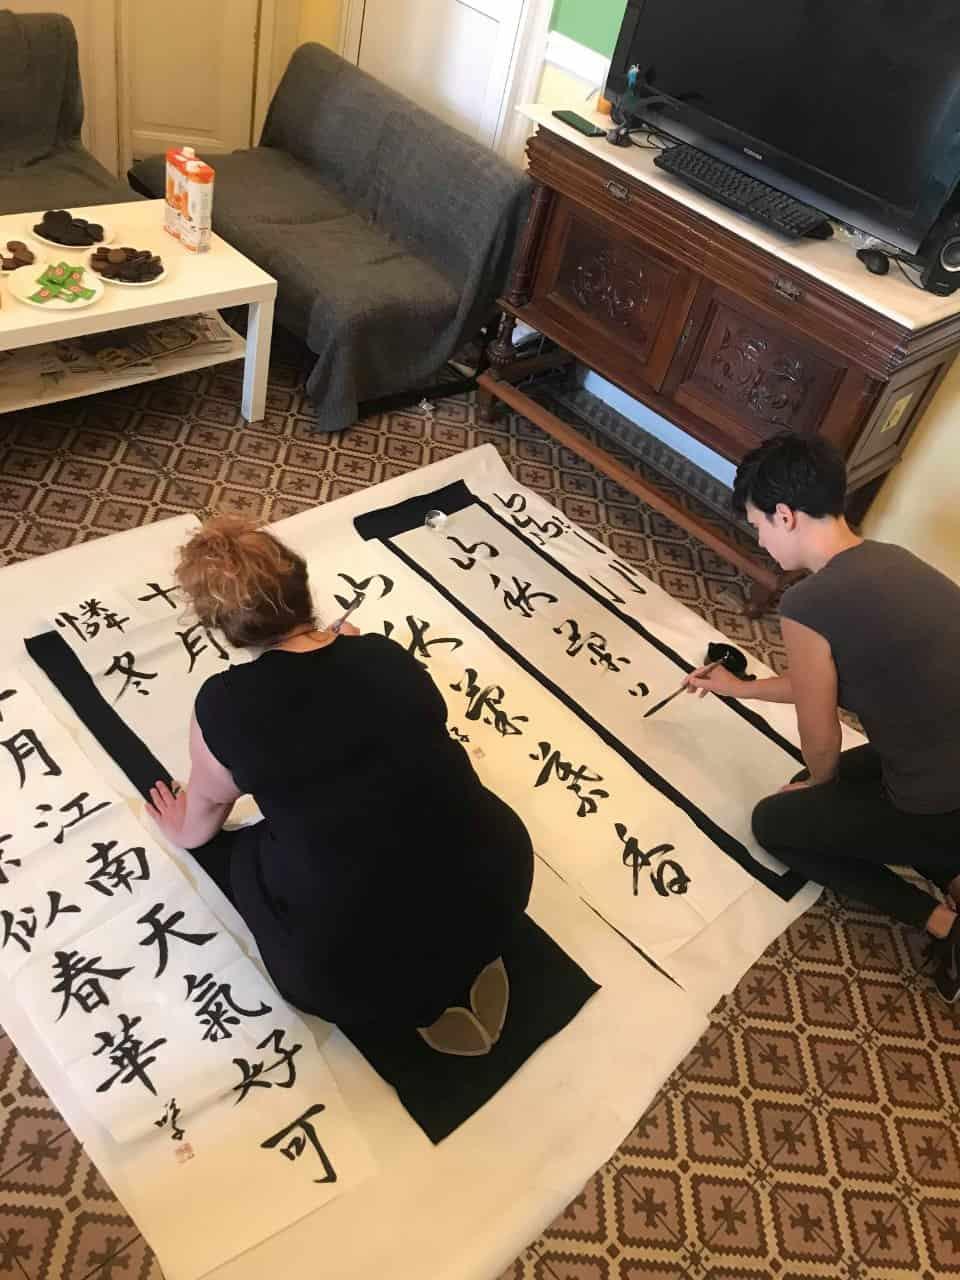 20190916005053 p - ギリシャでの書道教室 Calligraphy workshop in Greece